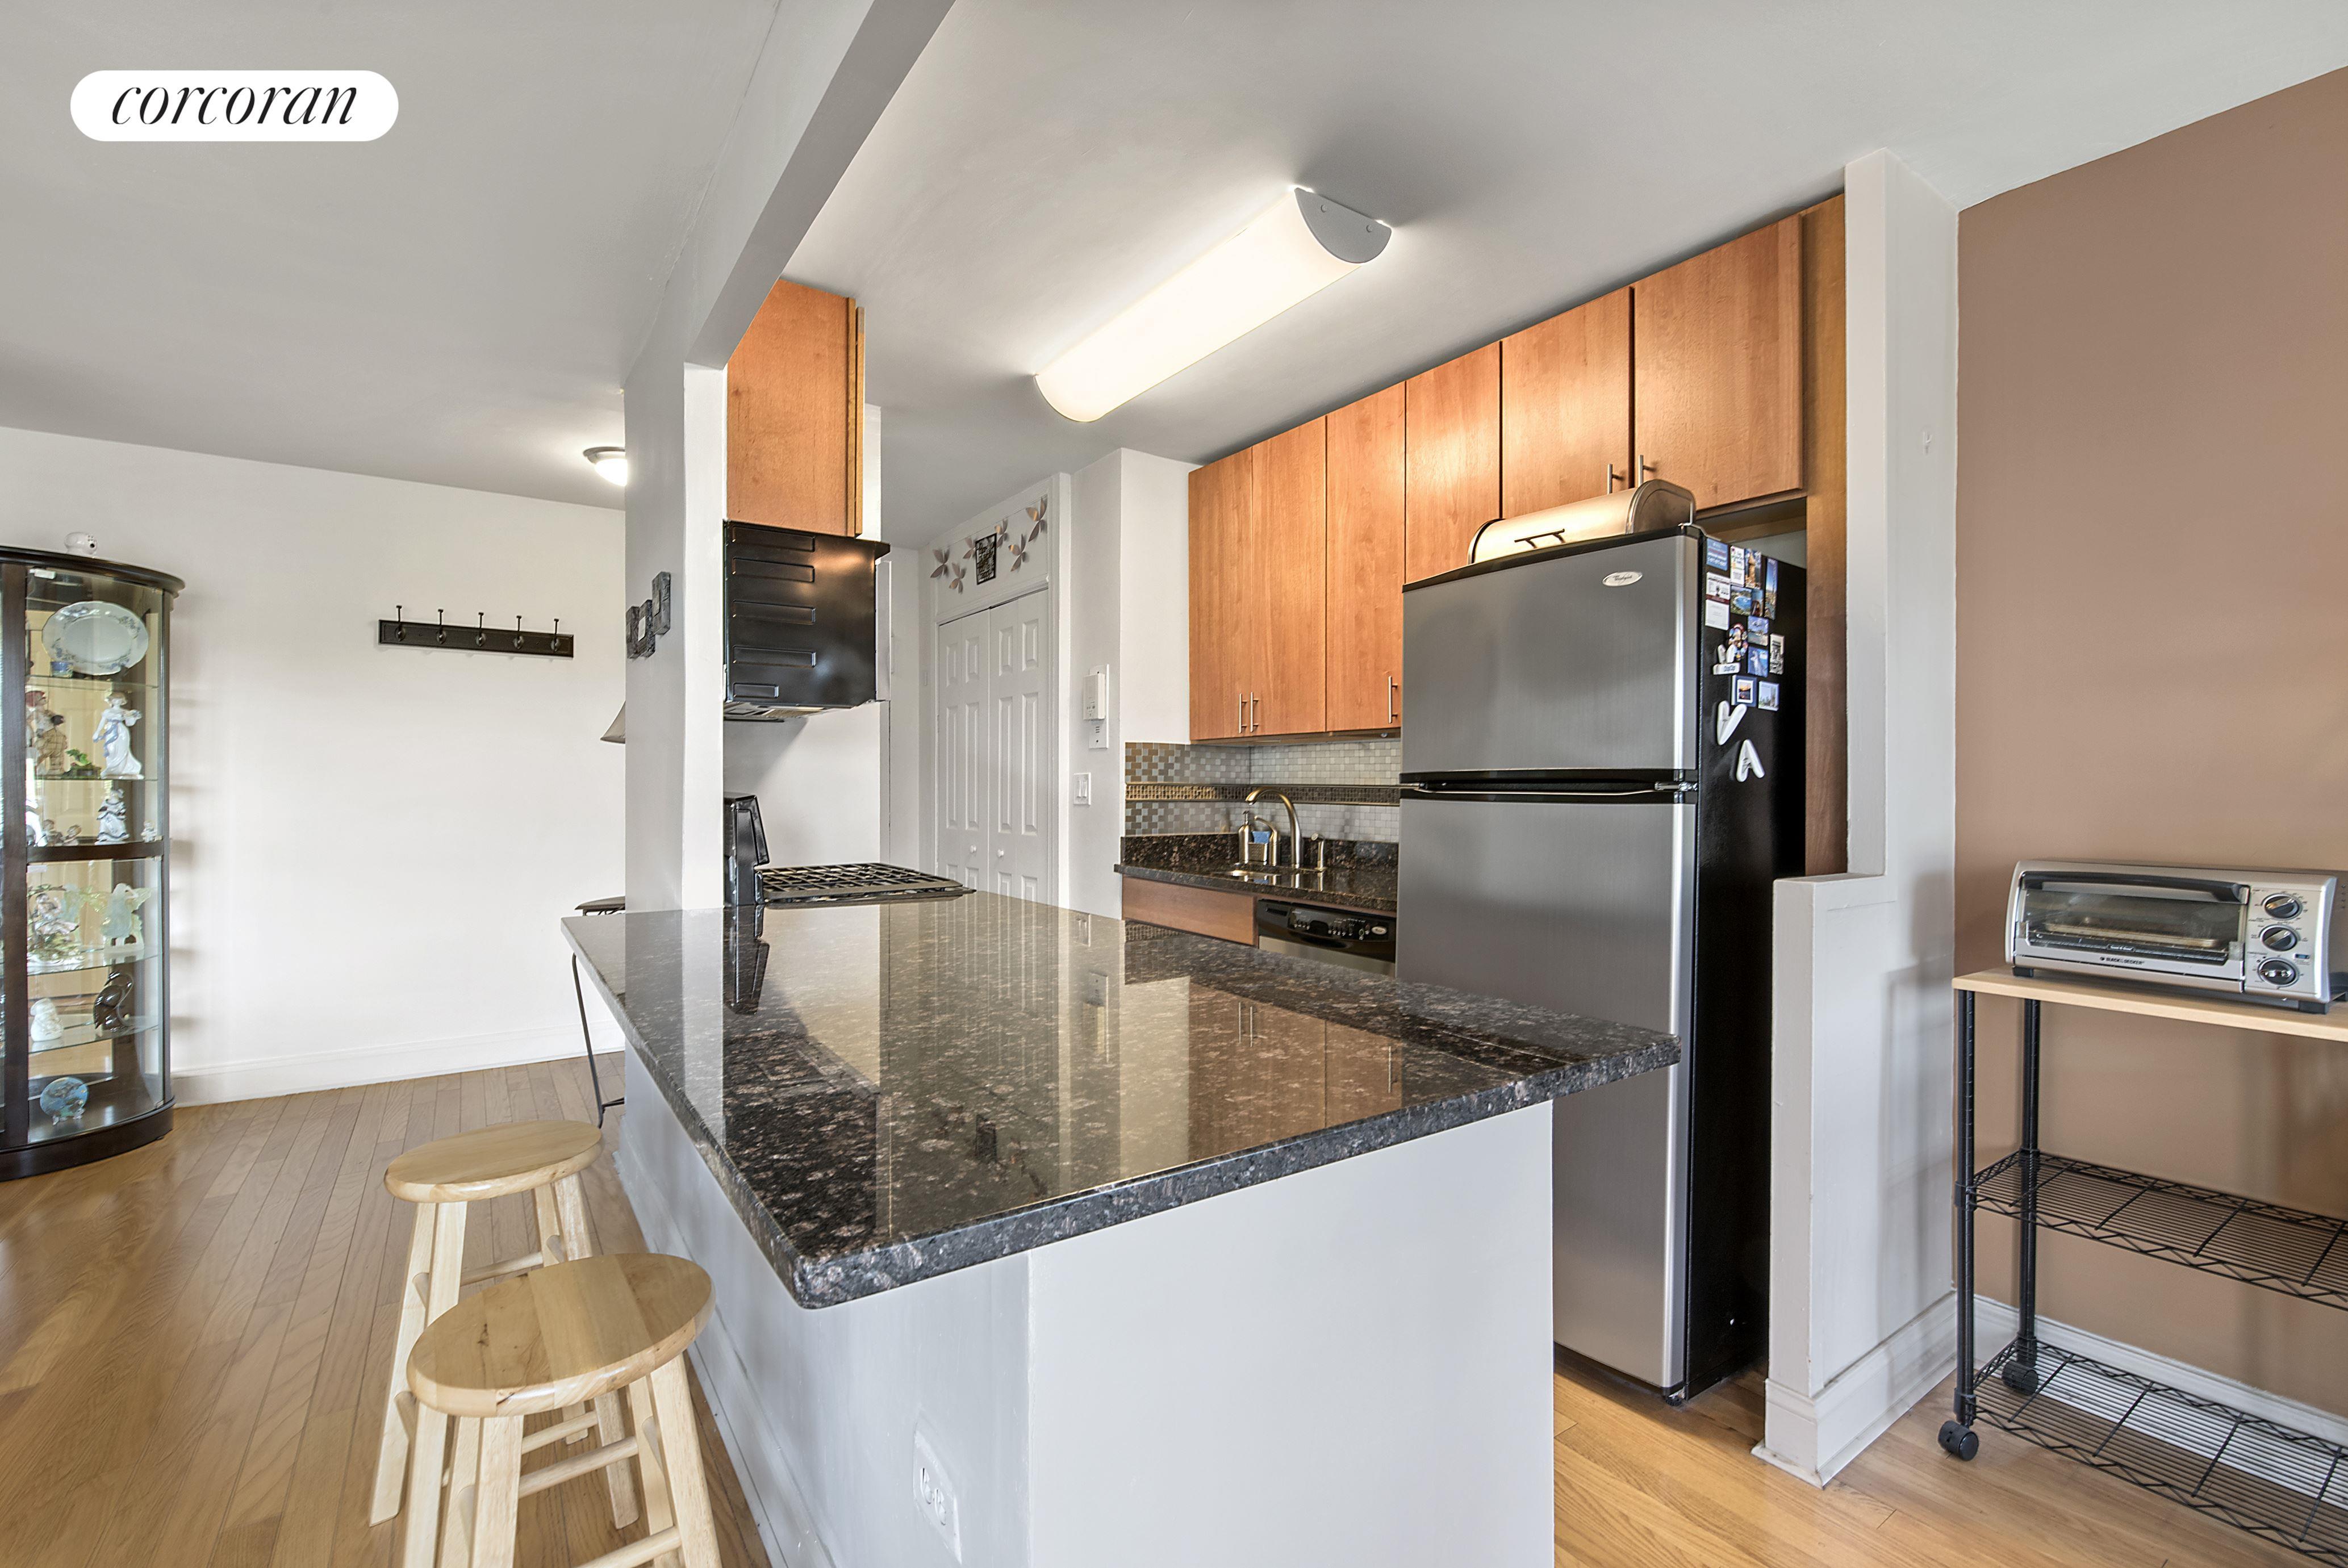 Gateway Elton Apartments Floor Plans: Corcoran, 12421 Flatlands Avenue, Apt. 6E, East New York